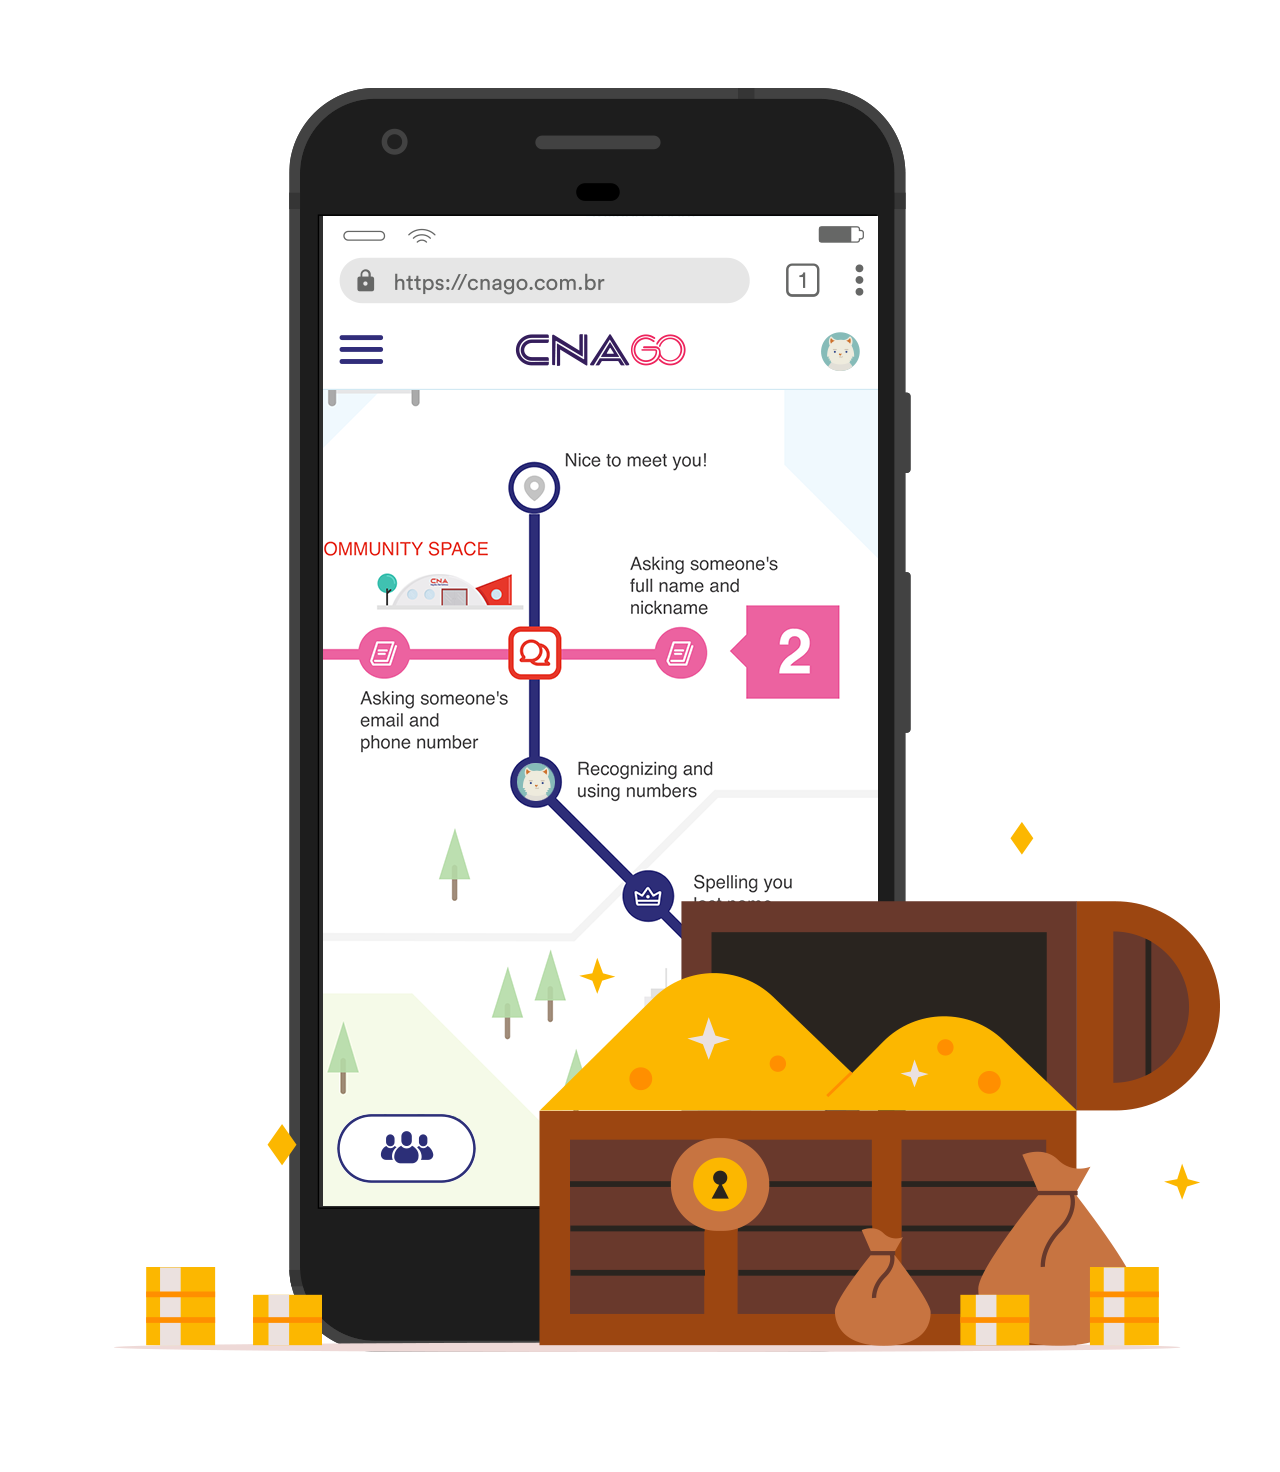 cna-go-map-2